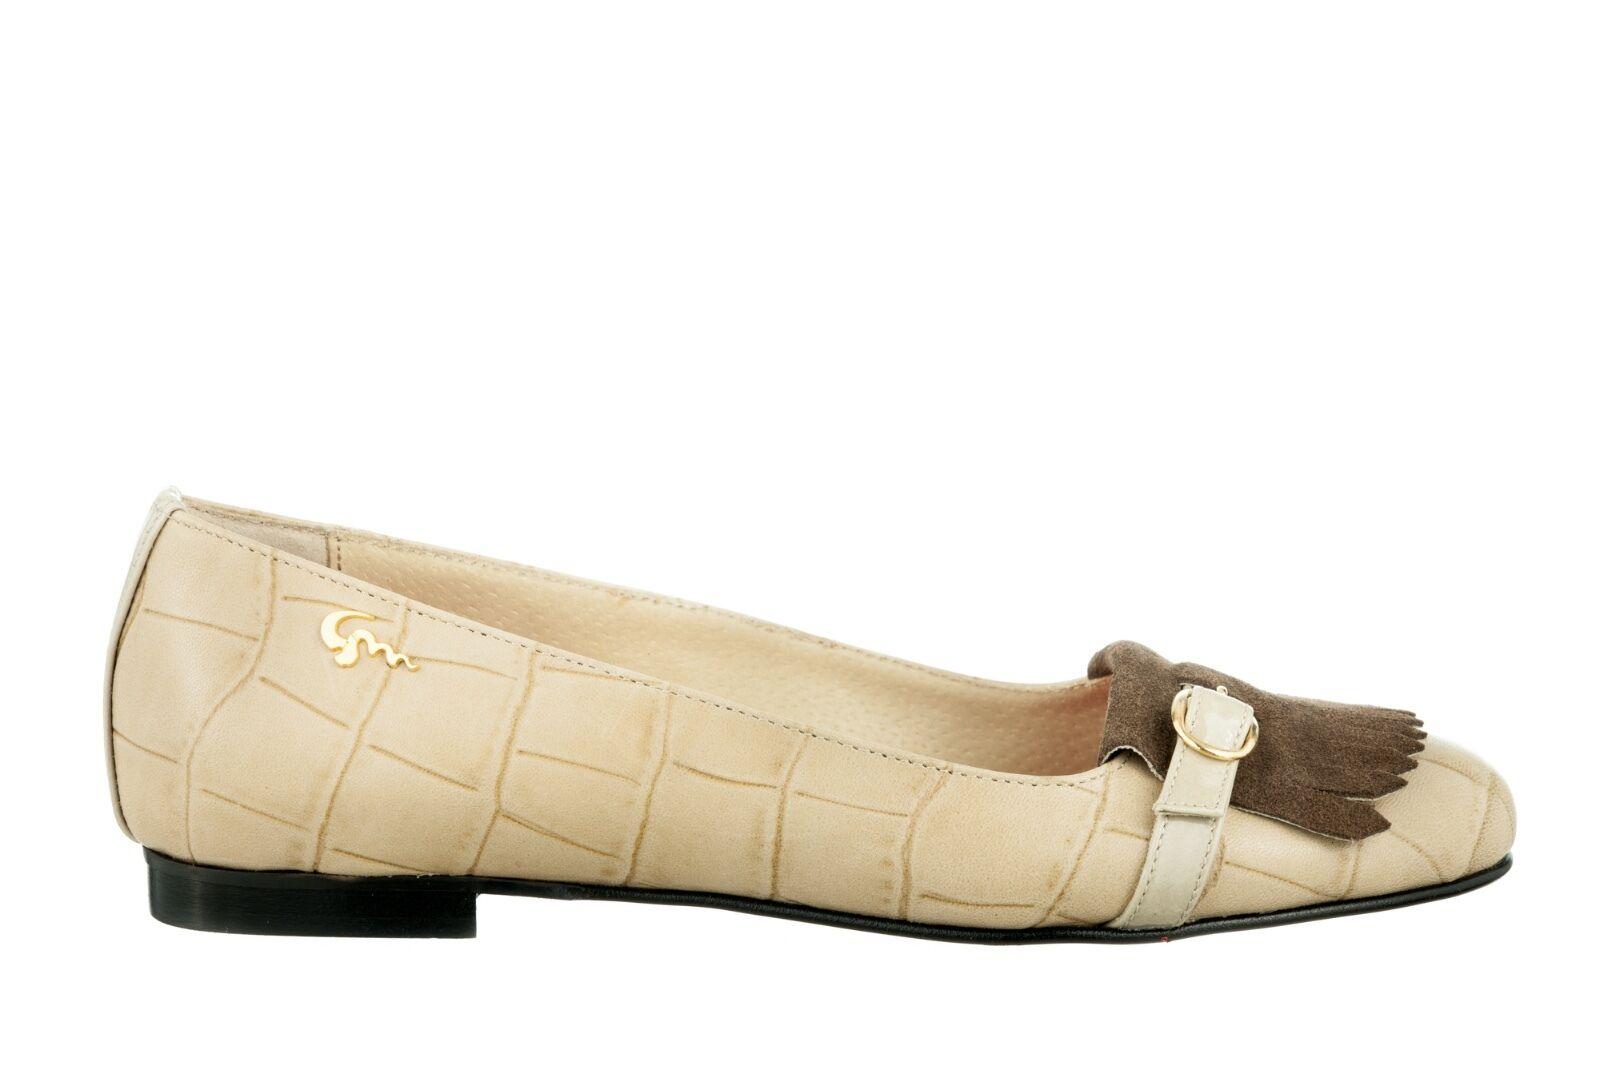 MORI MADE ITALY FLATS SCHUHE Schuhe LEATHER BALLERINA KROCO SUEDE LEATHER Schuhe BEIGE NUDE 44 2a8d42